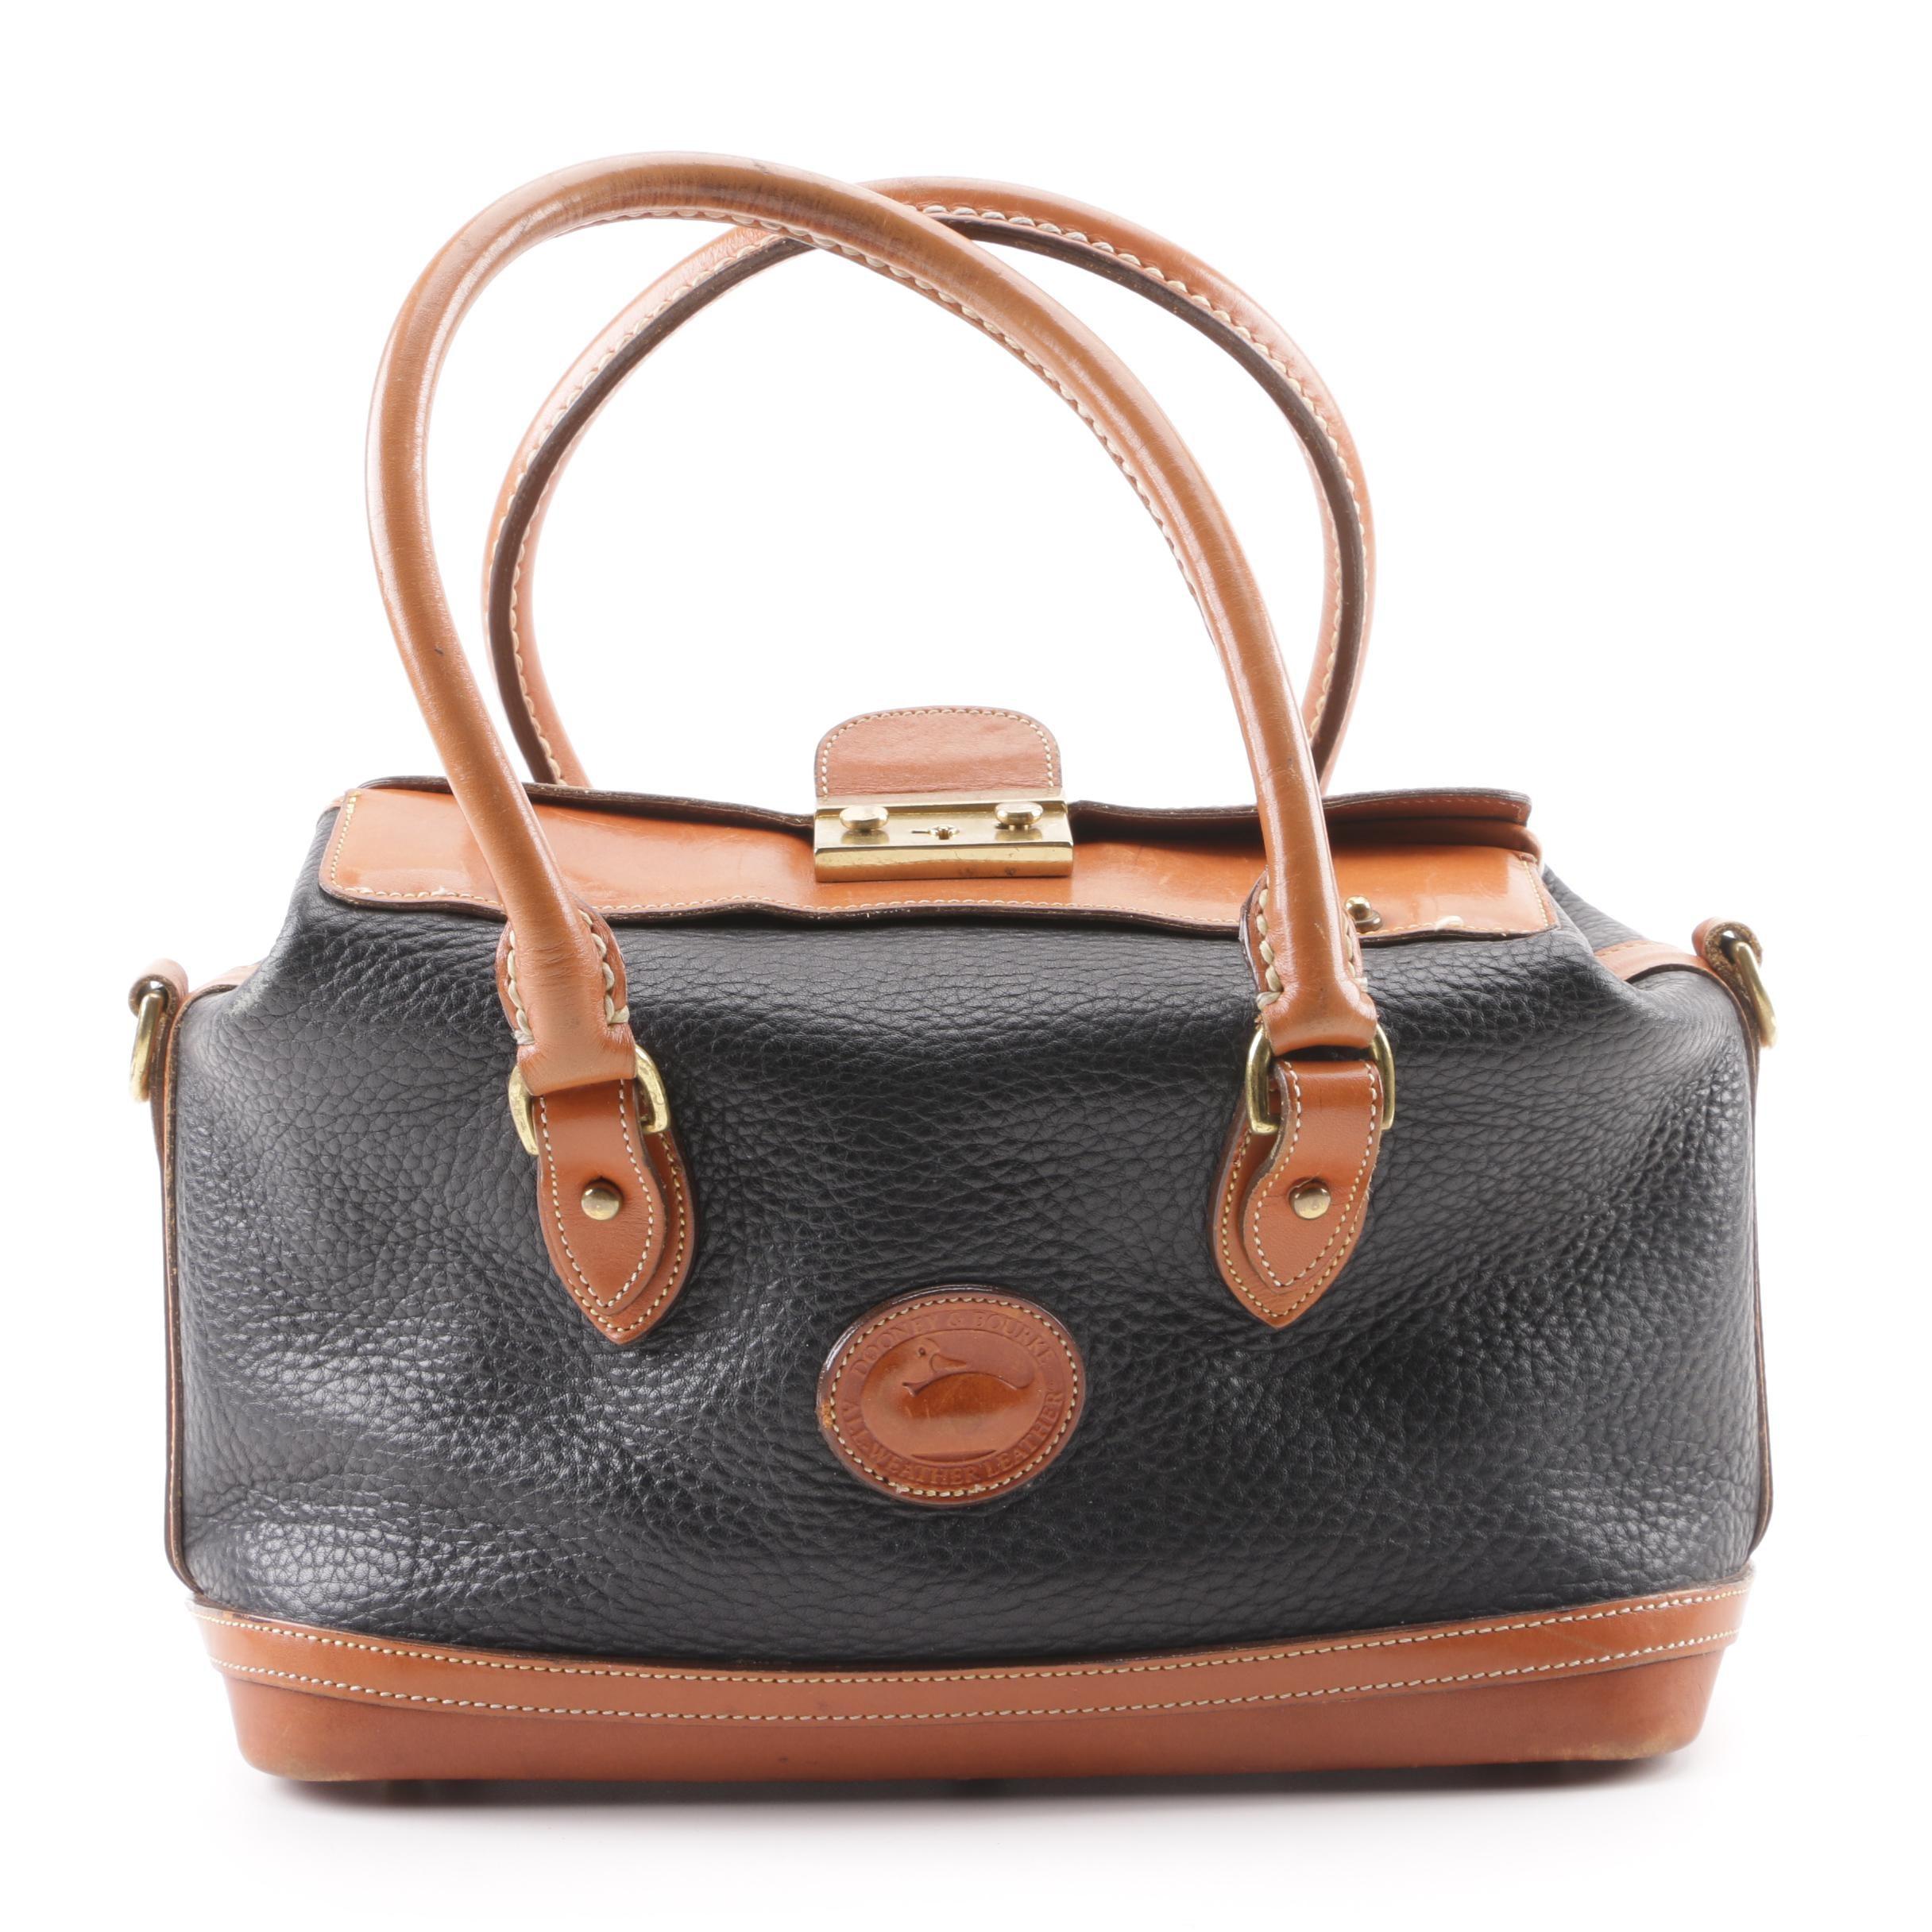 Dooney & Bourke All-Weather Leather Handbag